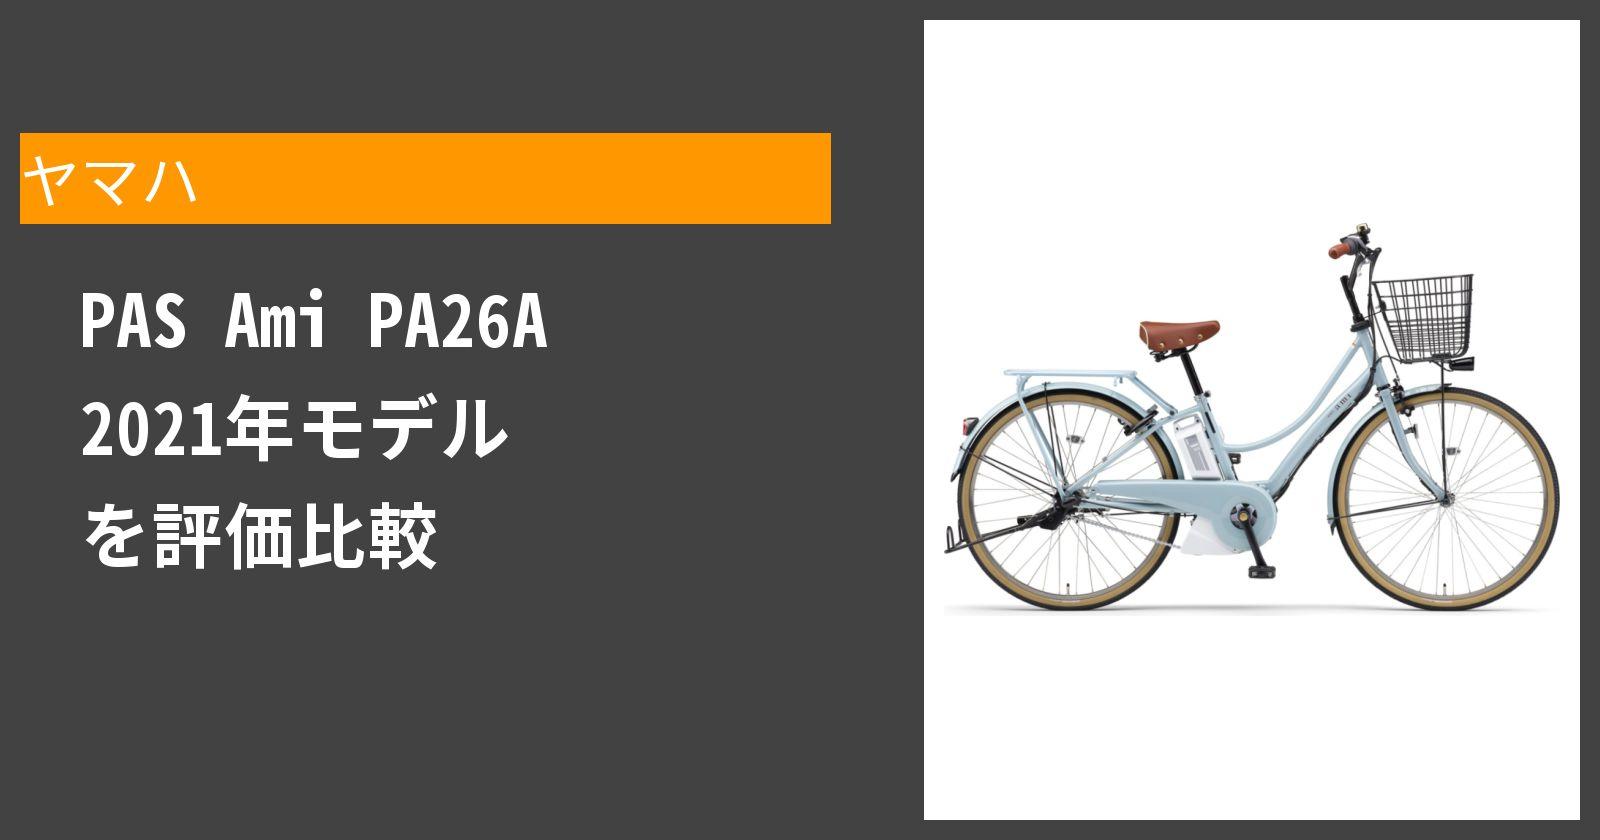 PAS Ami PA26A 2021年モデルを徹底評価